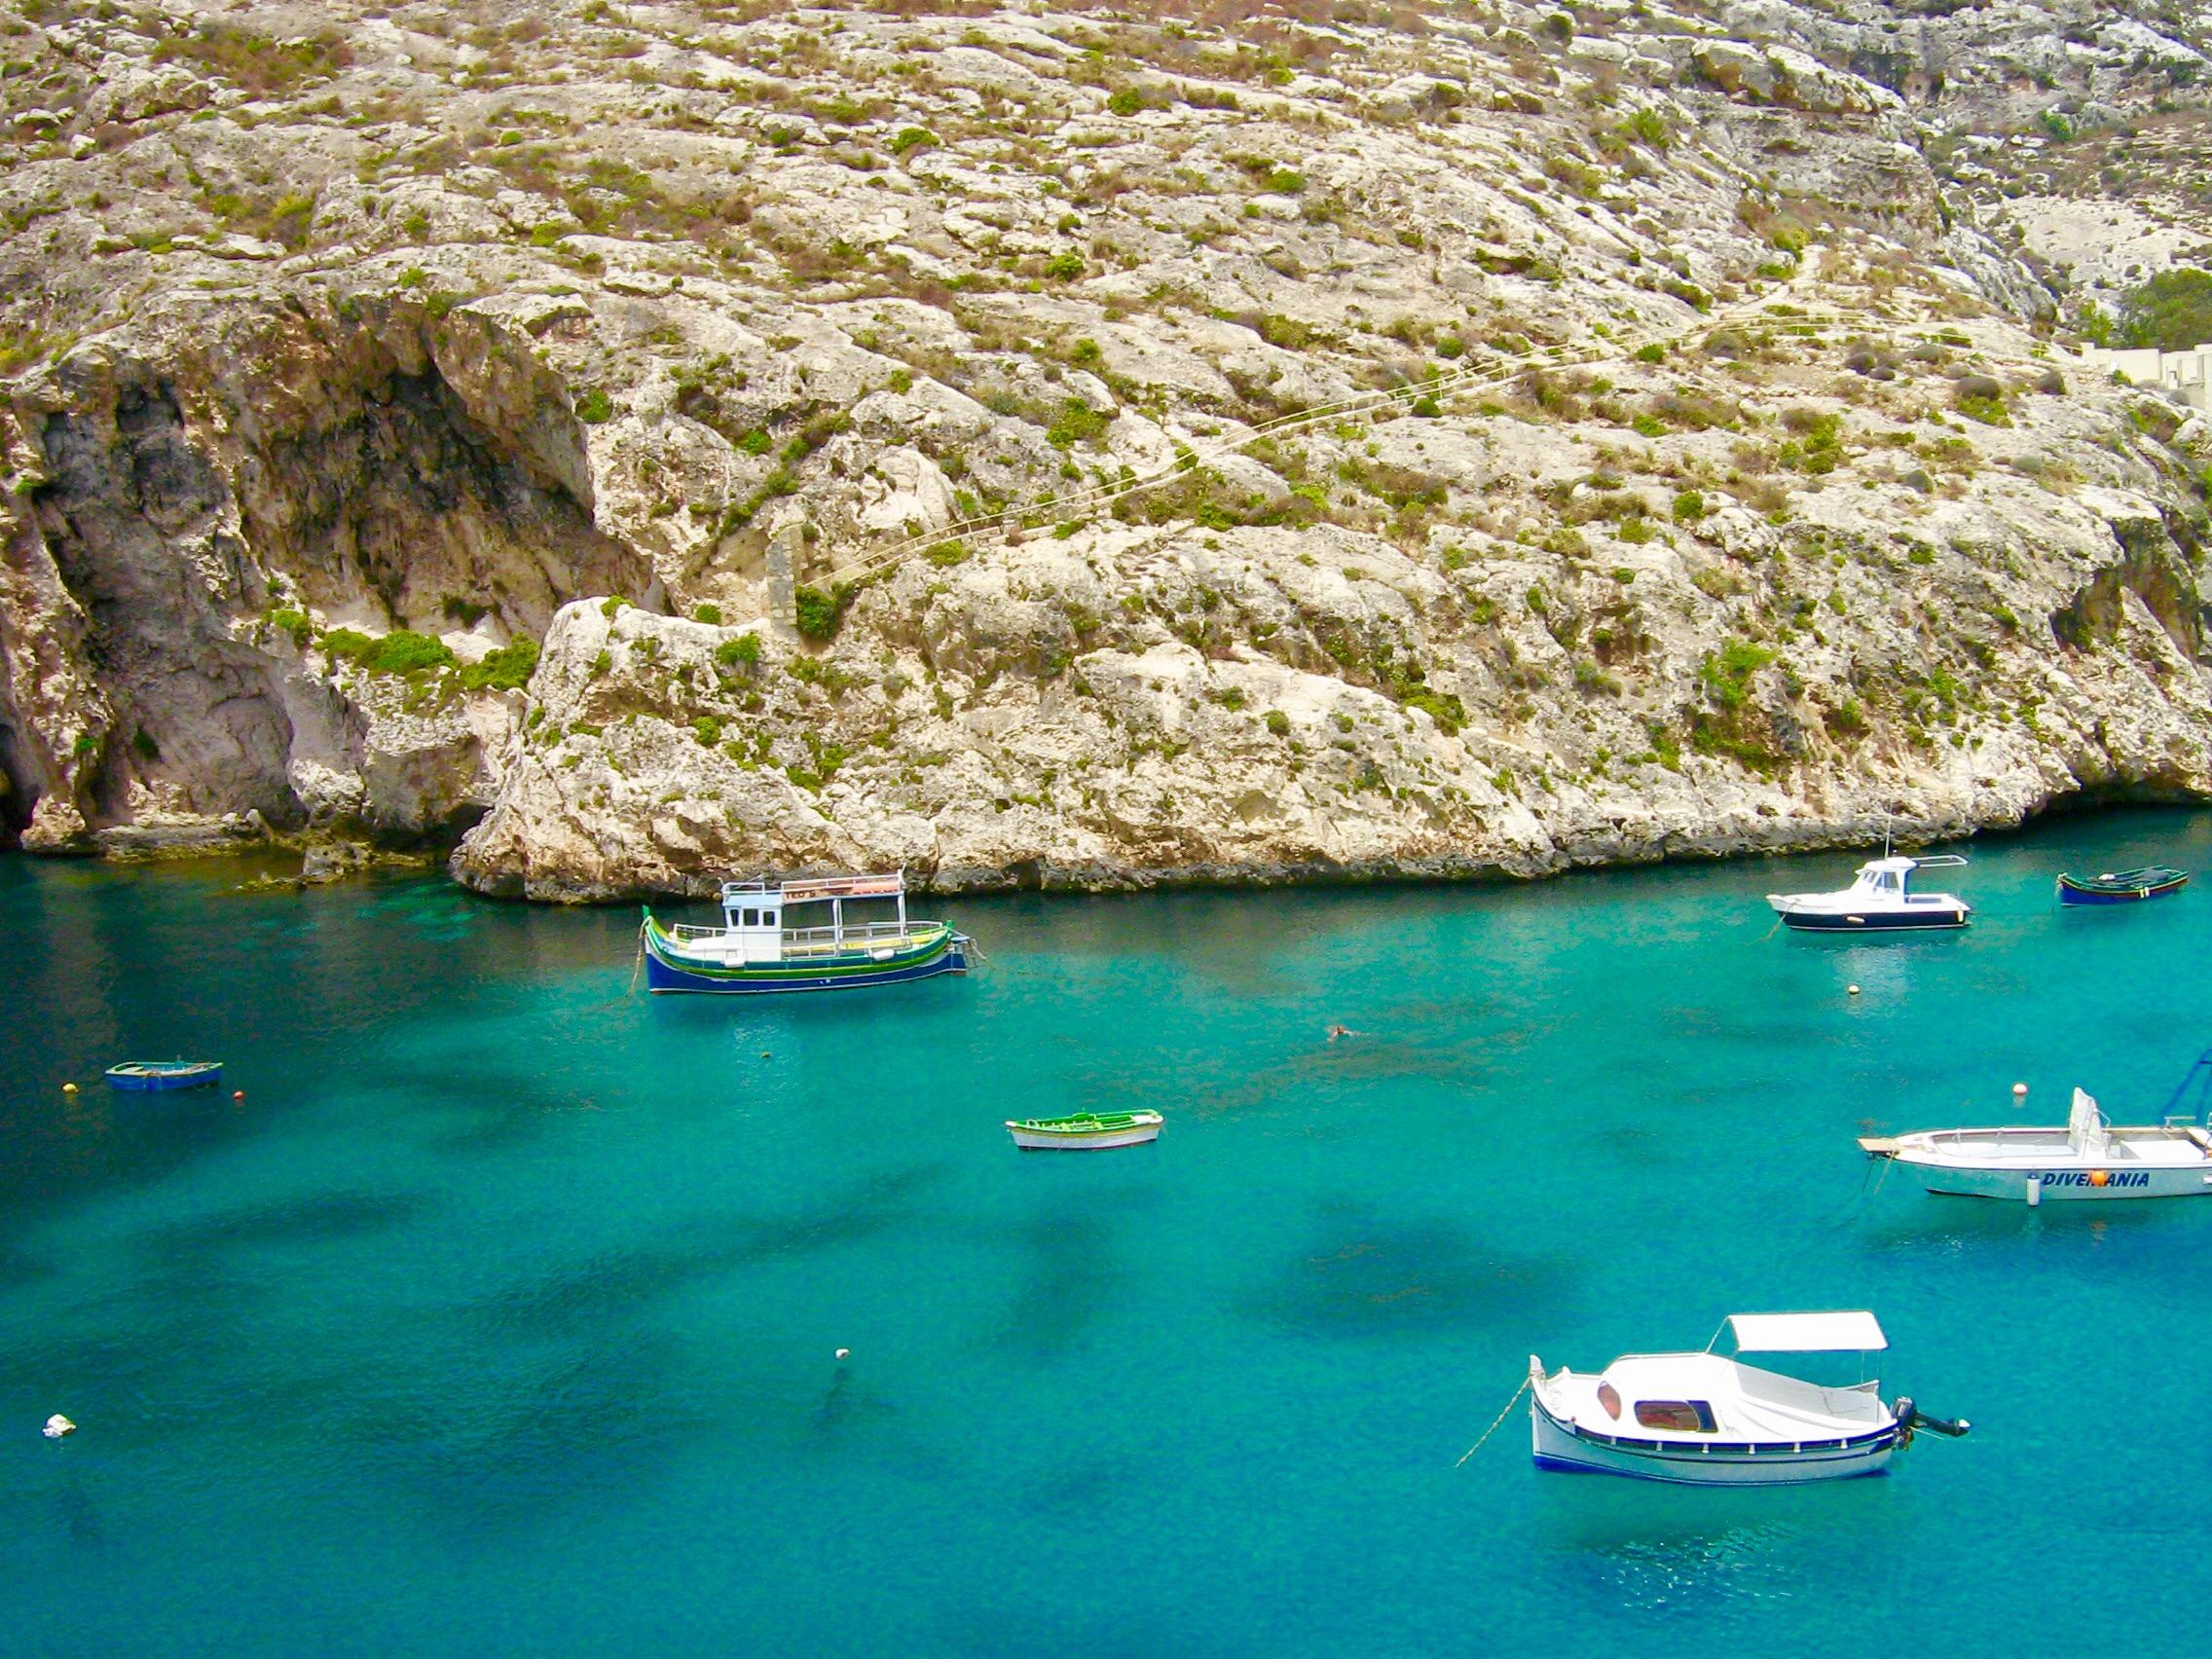 Malta Island Fishermen Boats